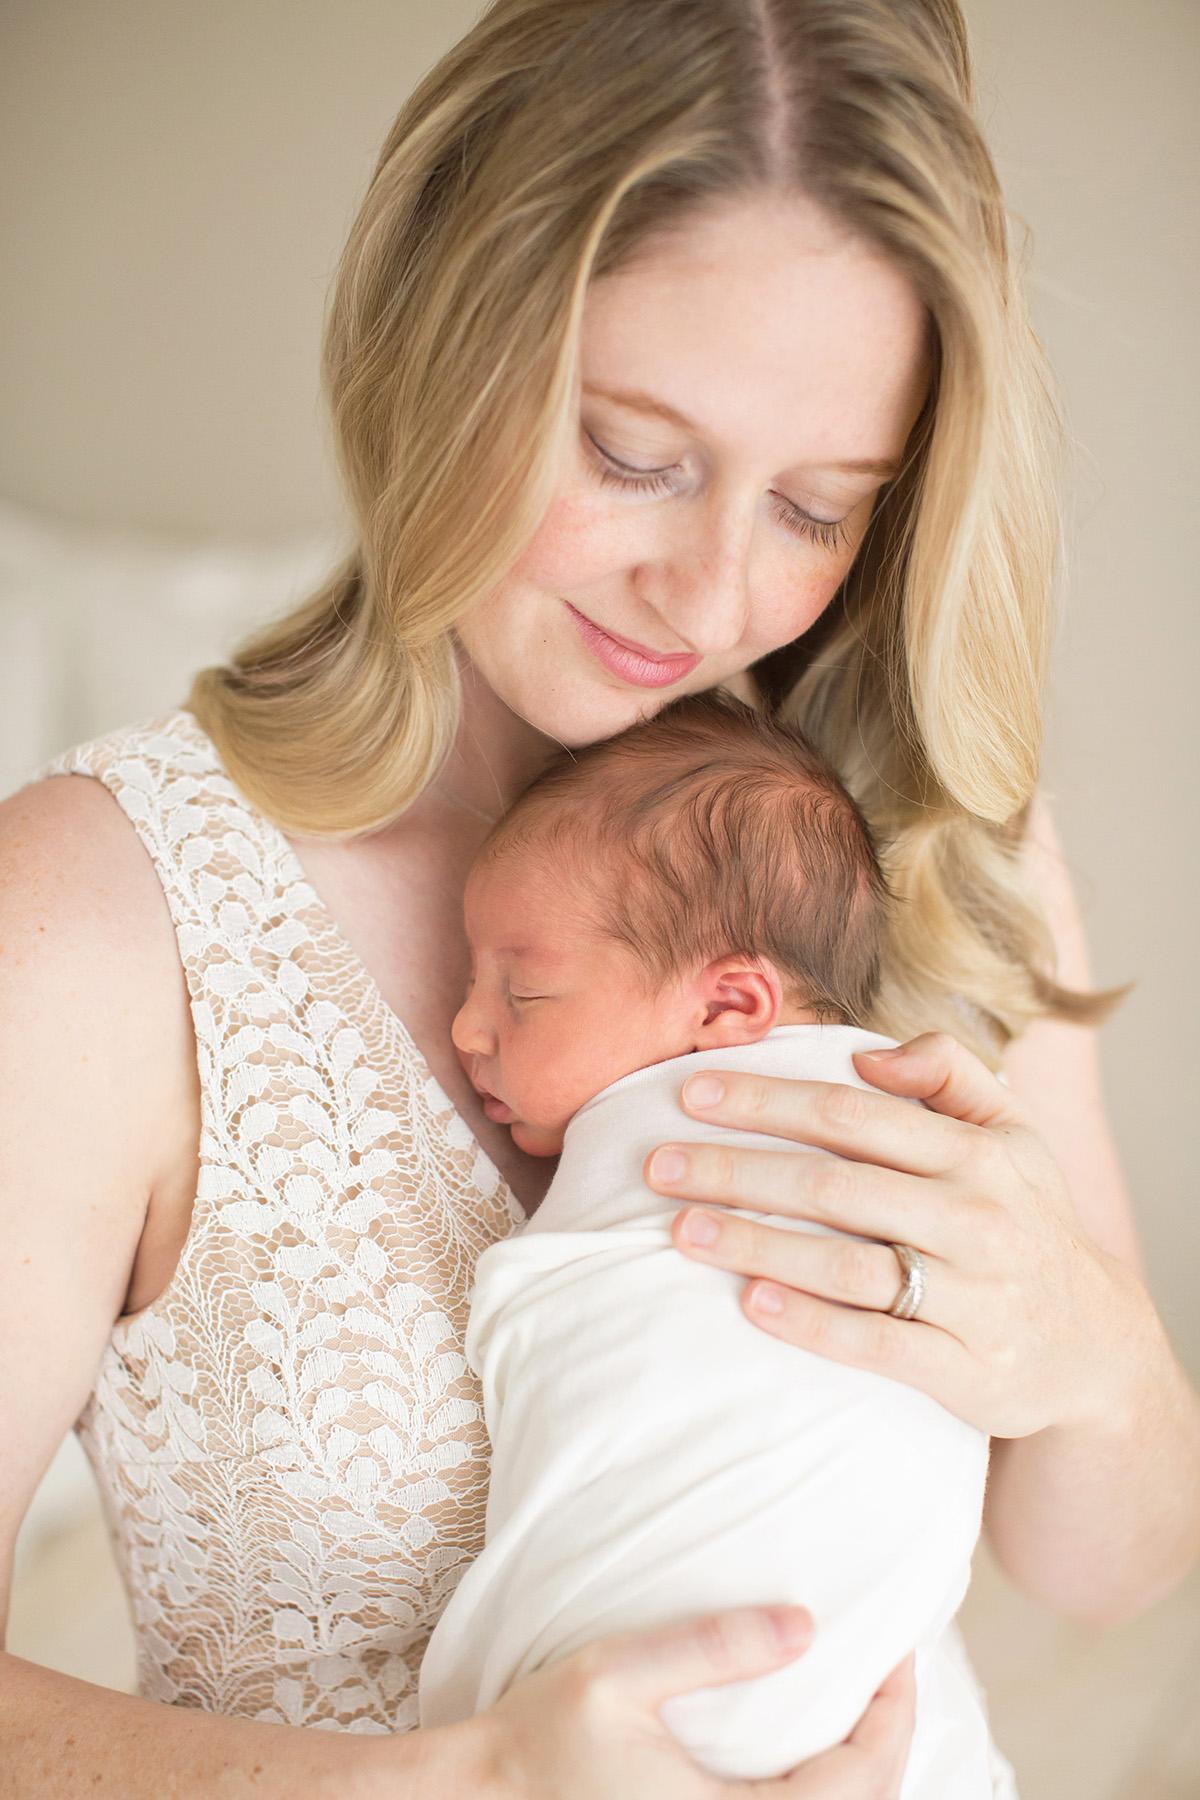 Newborn Photographer Louisville KY   Julie Brock Photography   Perfect Dress for Newborn Photo Session   Mom holding baby   Maternity Photographer   Family Photographer Louisville.jpg